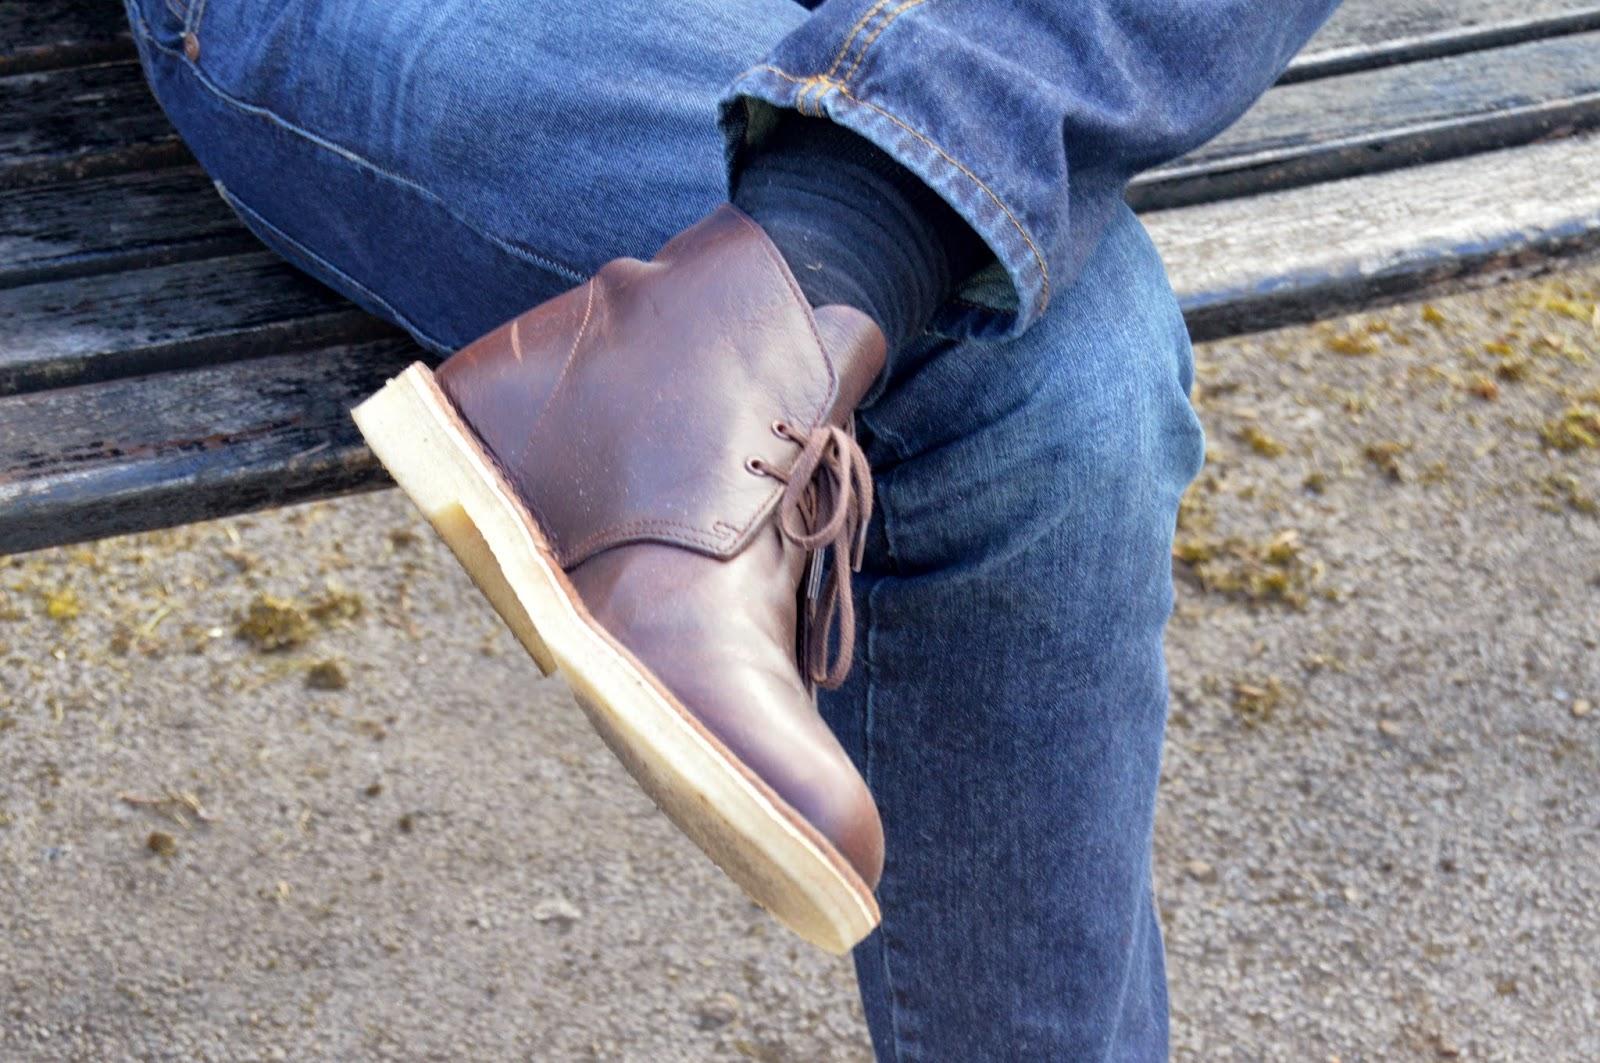 63c534f0c04 Clarks Original Desert Boots - Review - We're going on an adventure